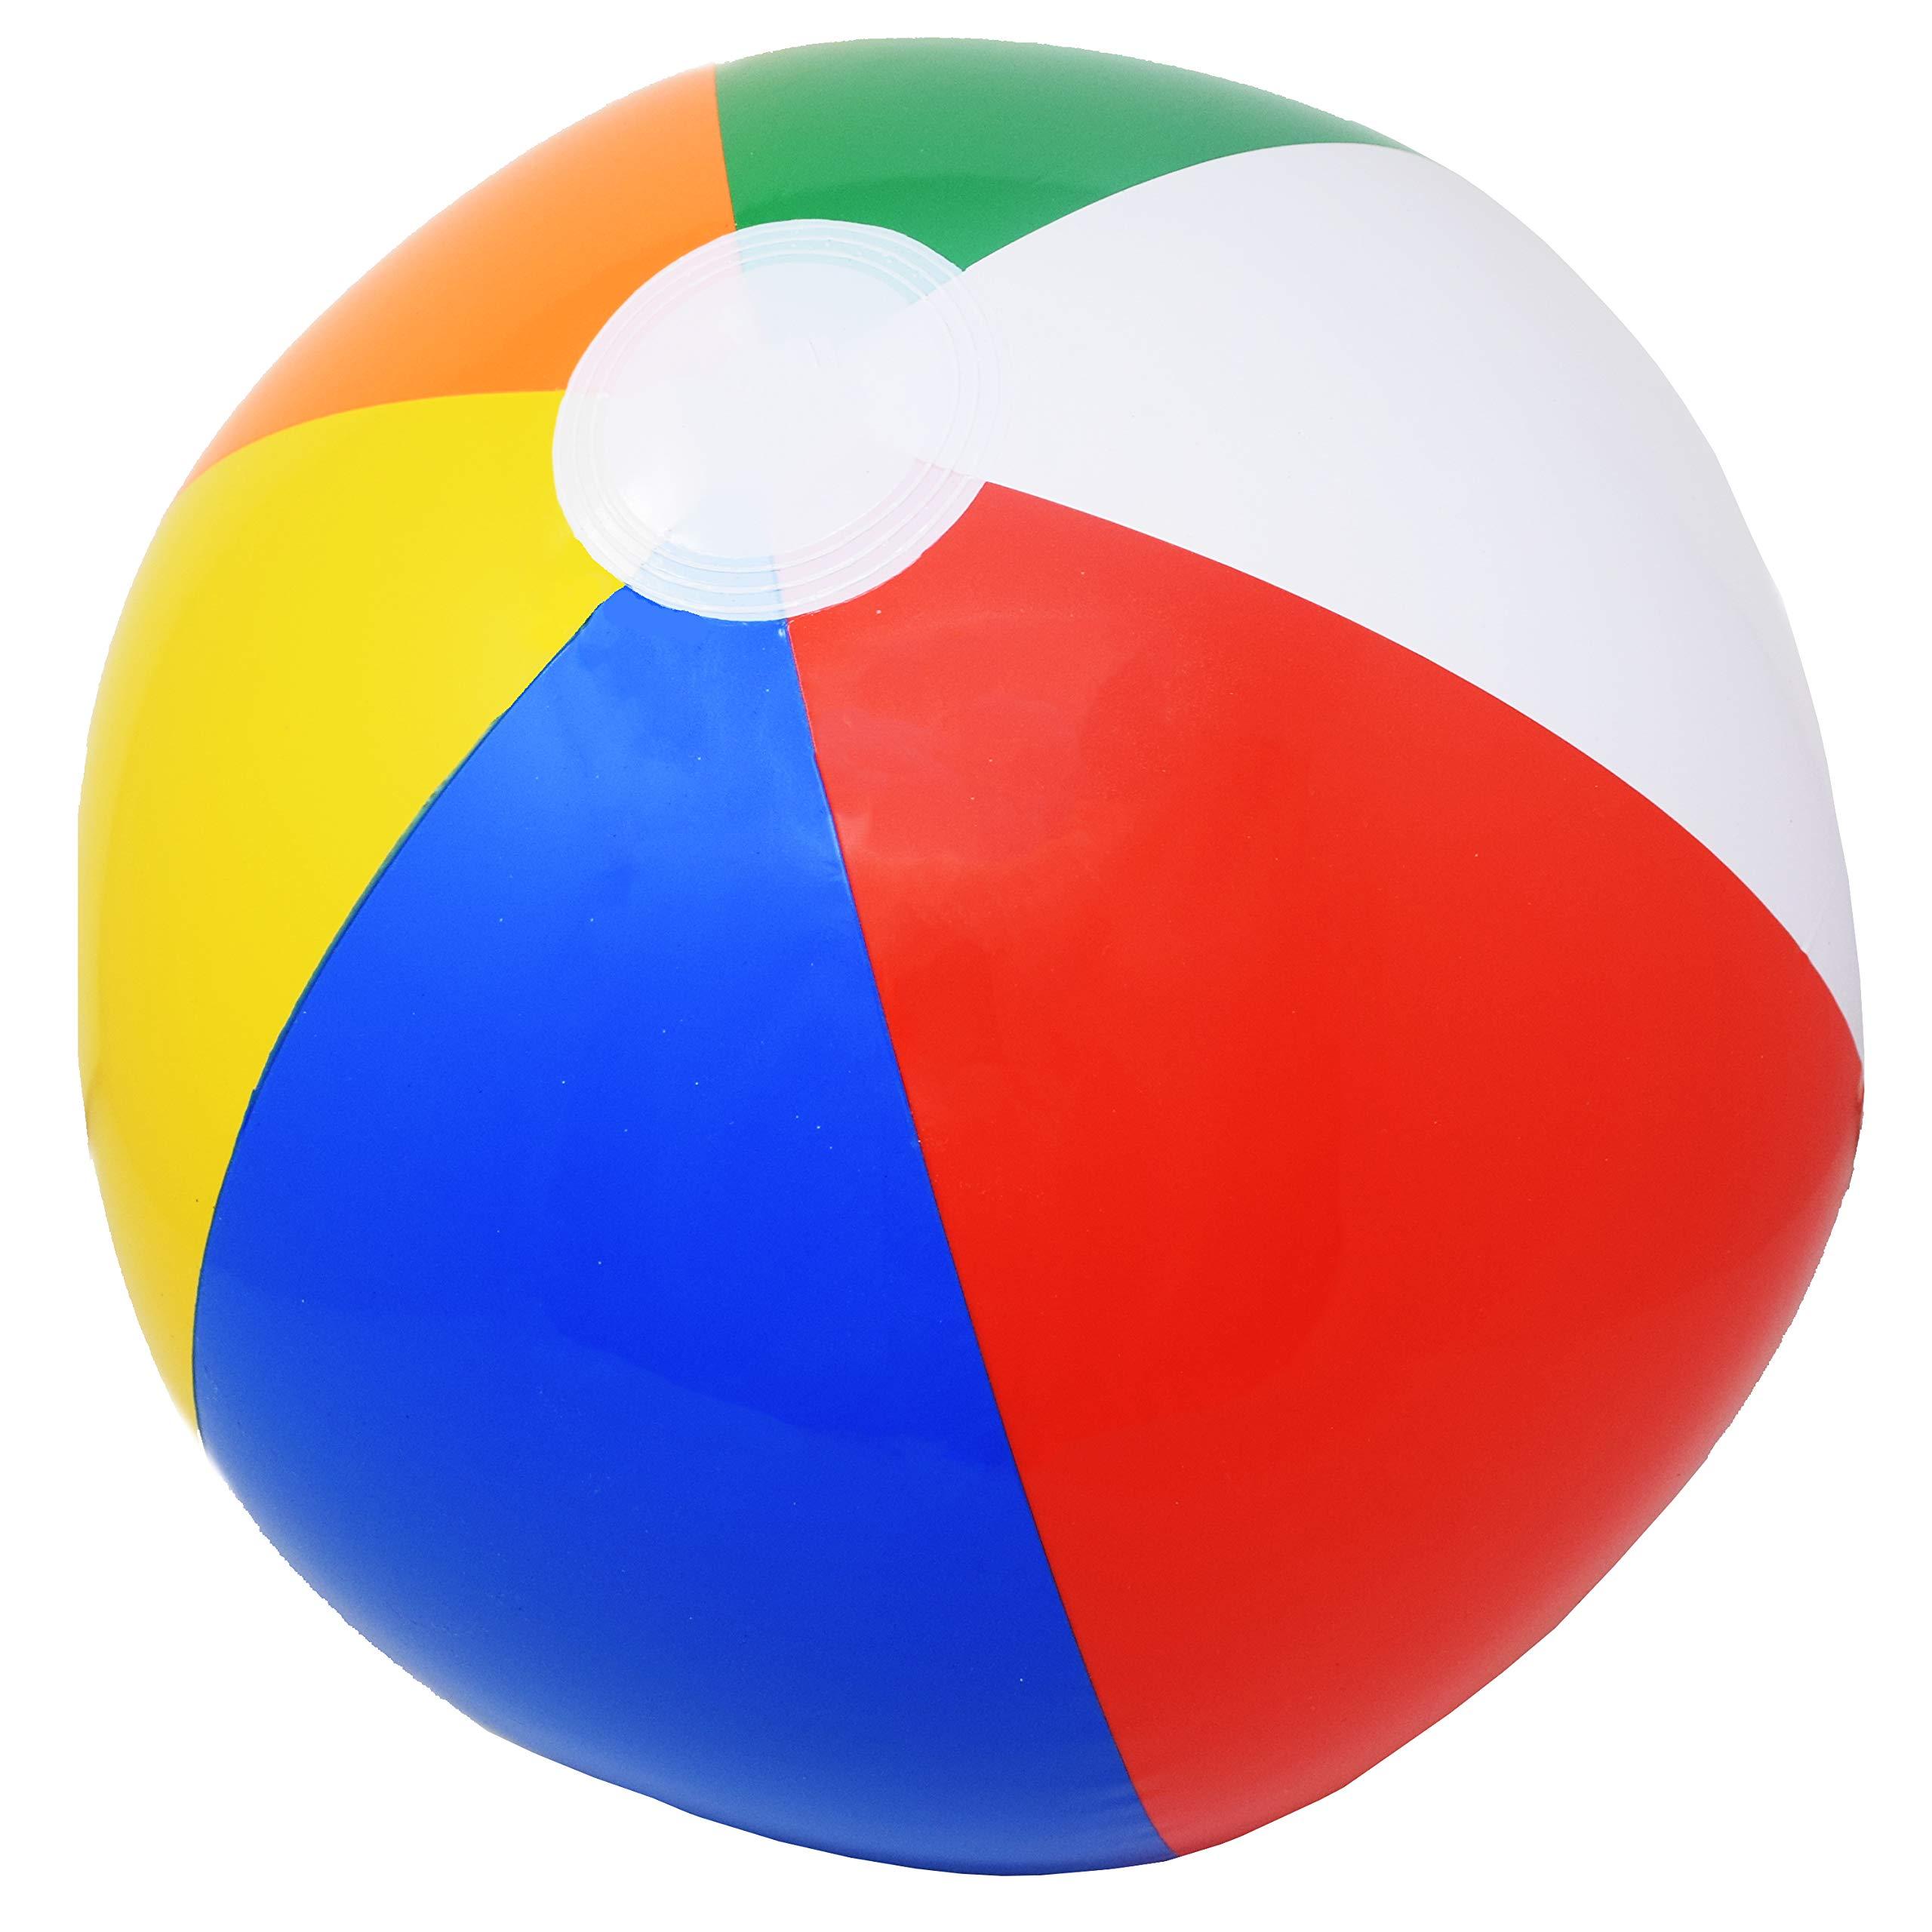 Beachgoer 20-Inch Bulk Pack of 12 Inflatable Rainbow Color Beach Balls - Large Plastic Inflatable Beachballs for Beach/Pool Parties/Summer Fun by Beachgoer